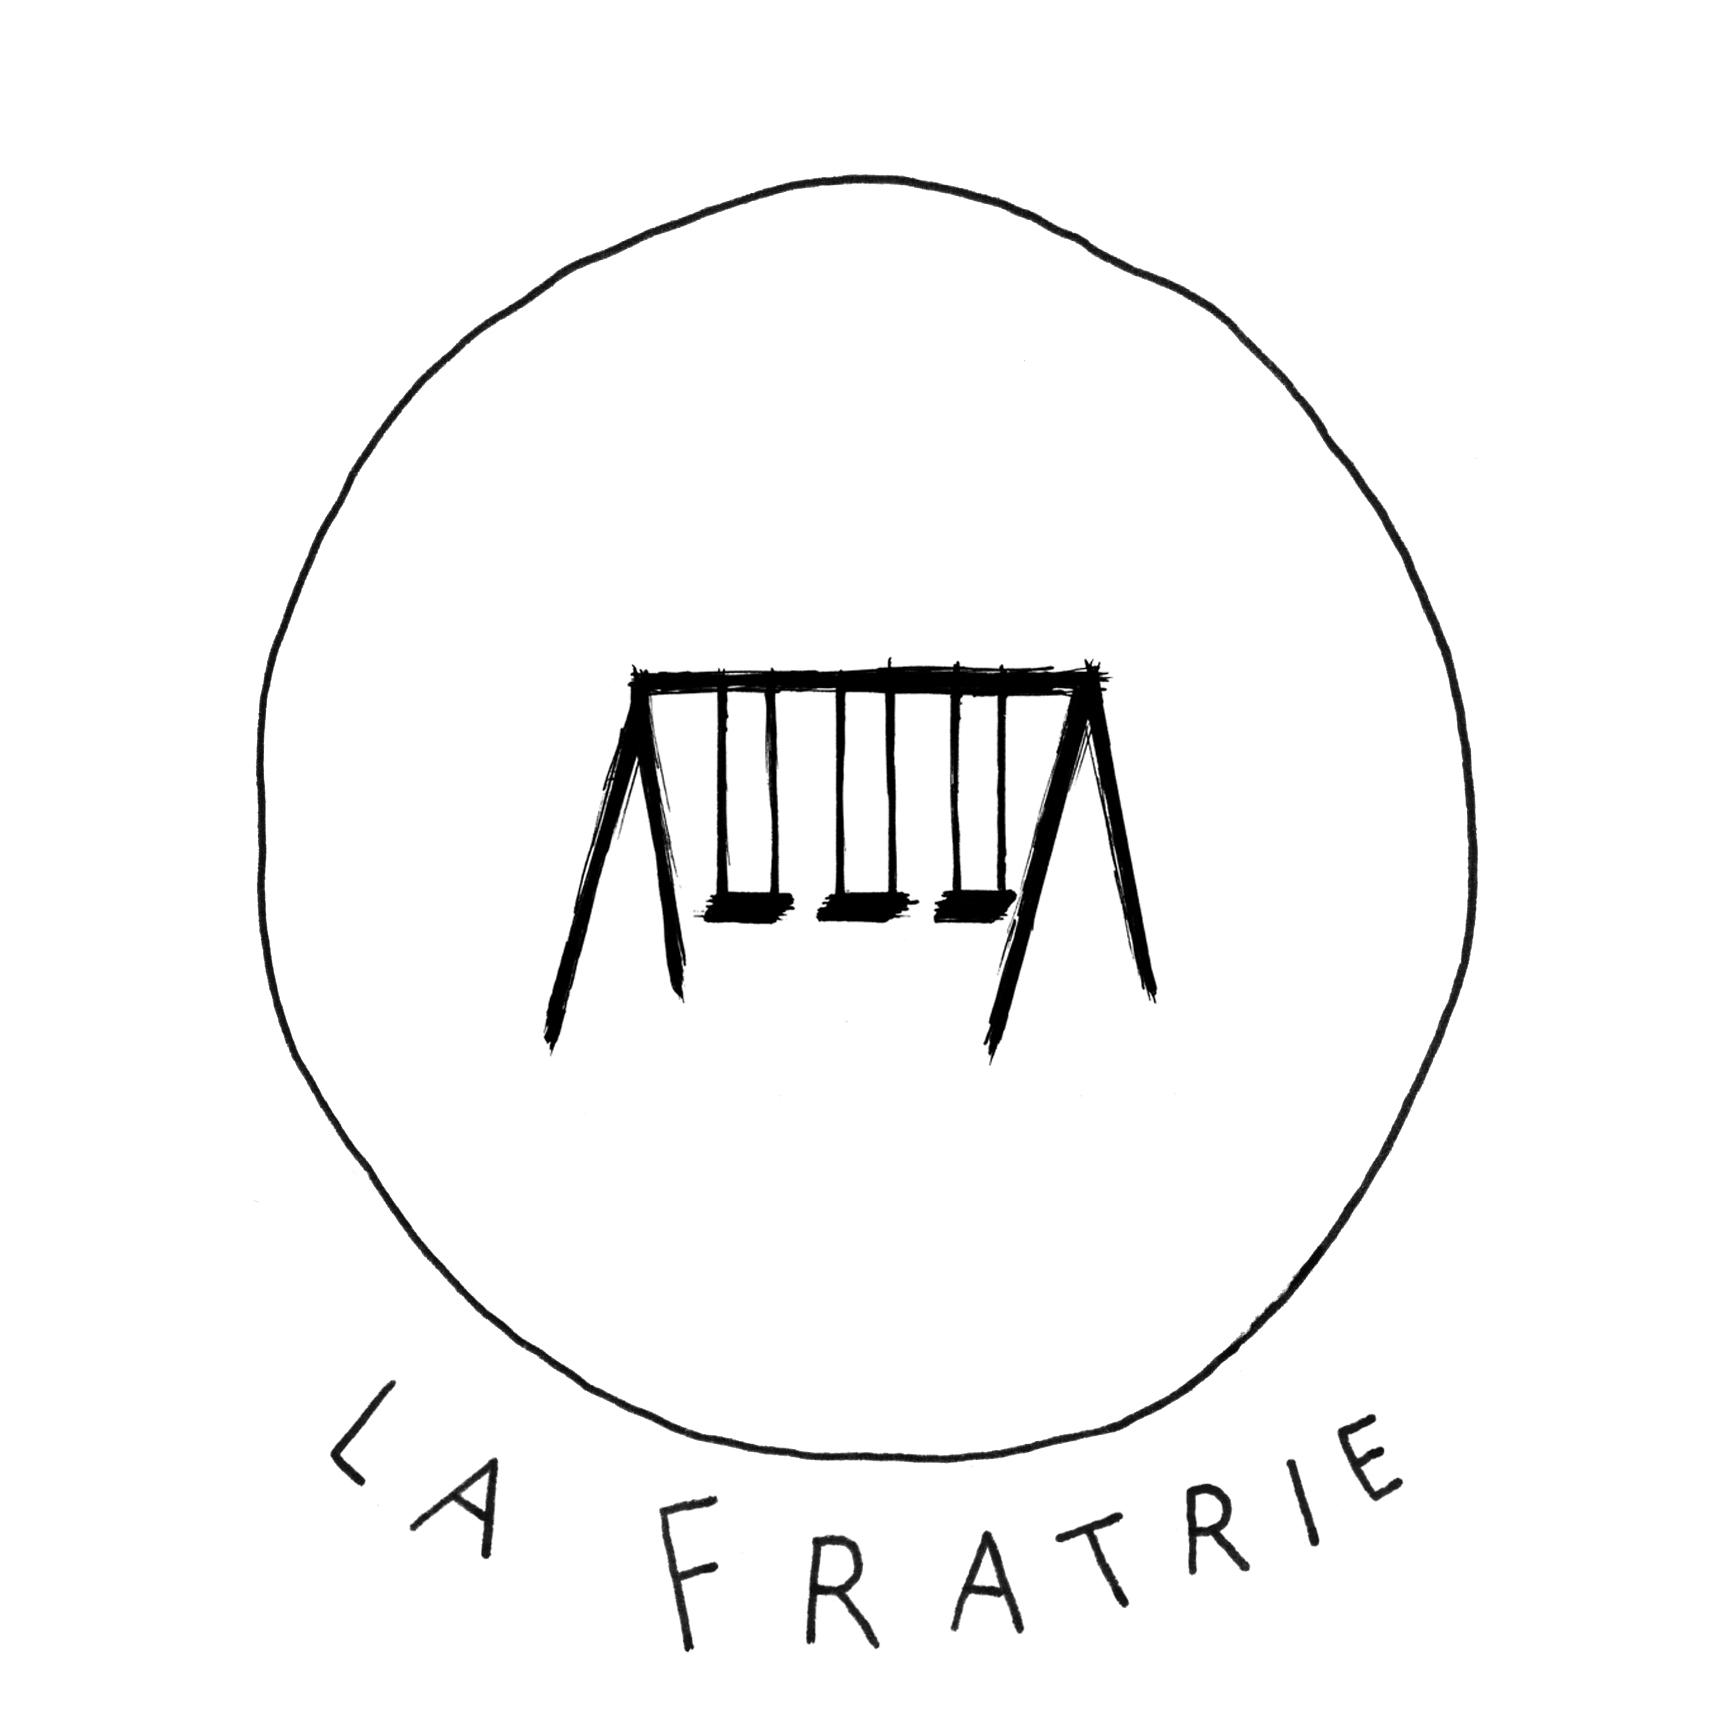 logo Fratrie.png